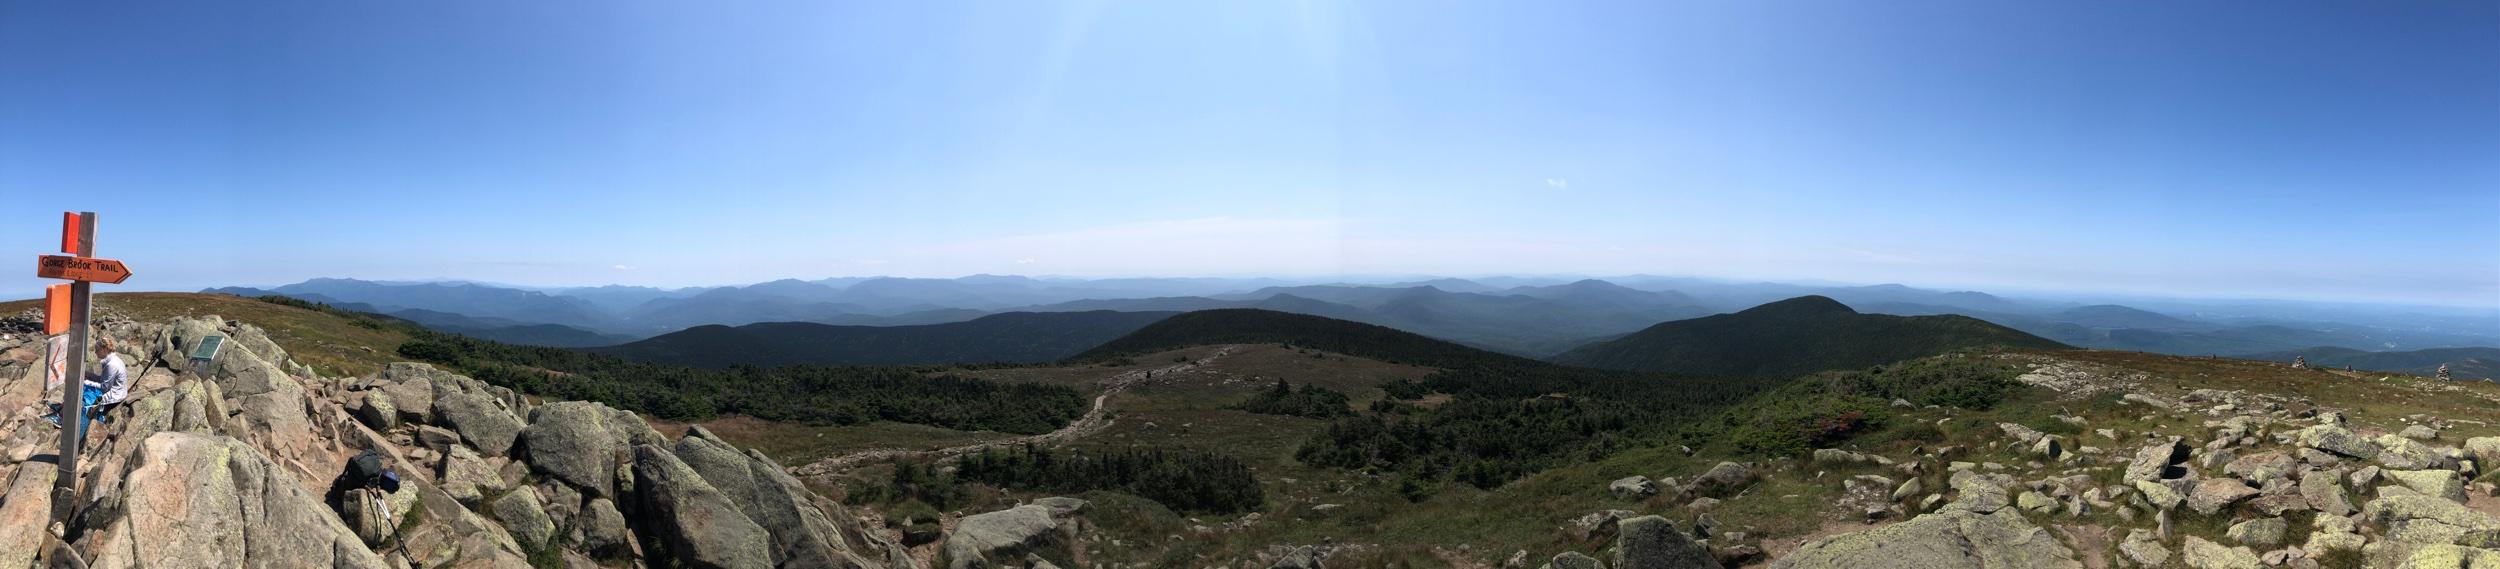 The Summit of Mt. Moosilauke